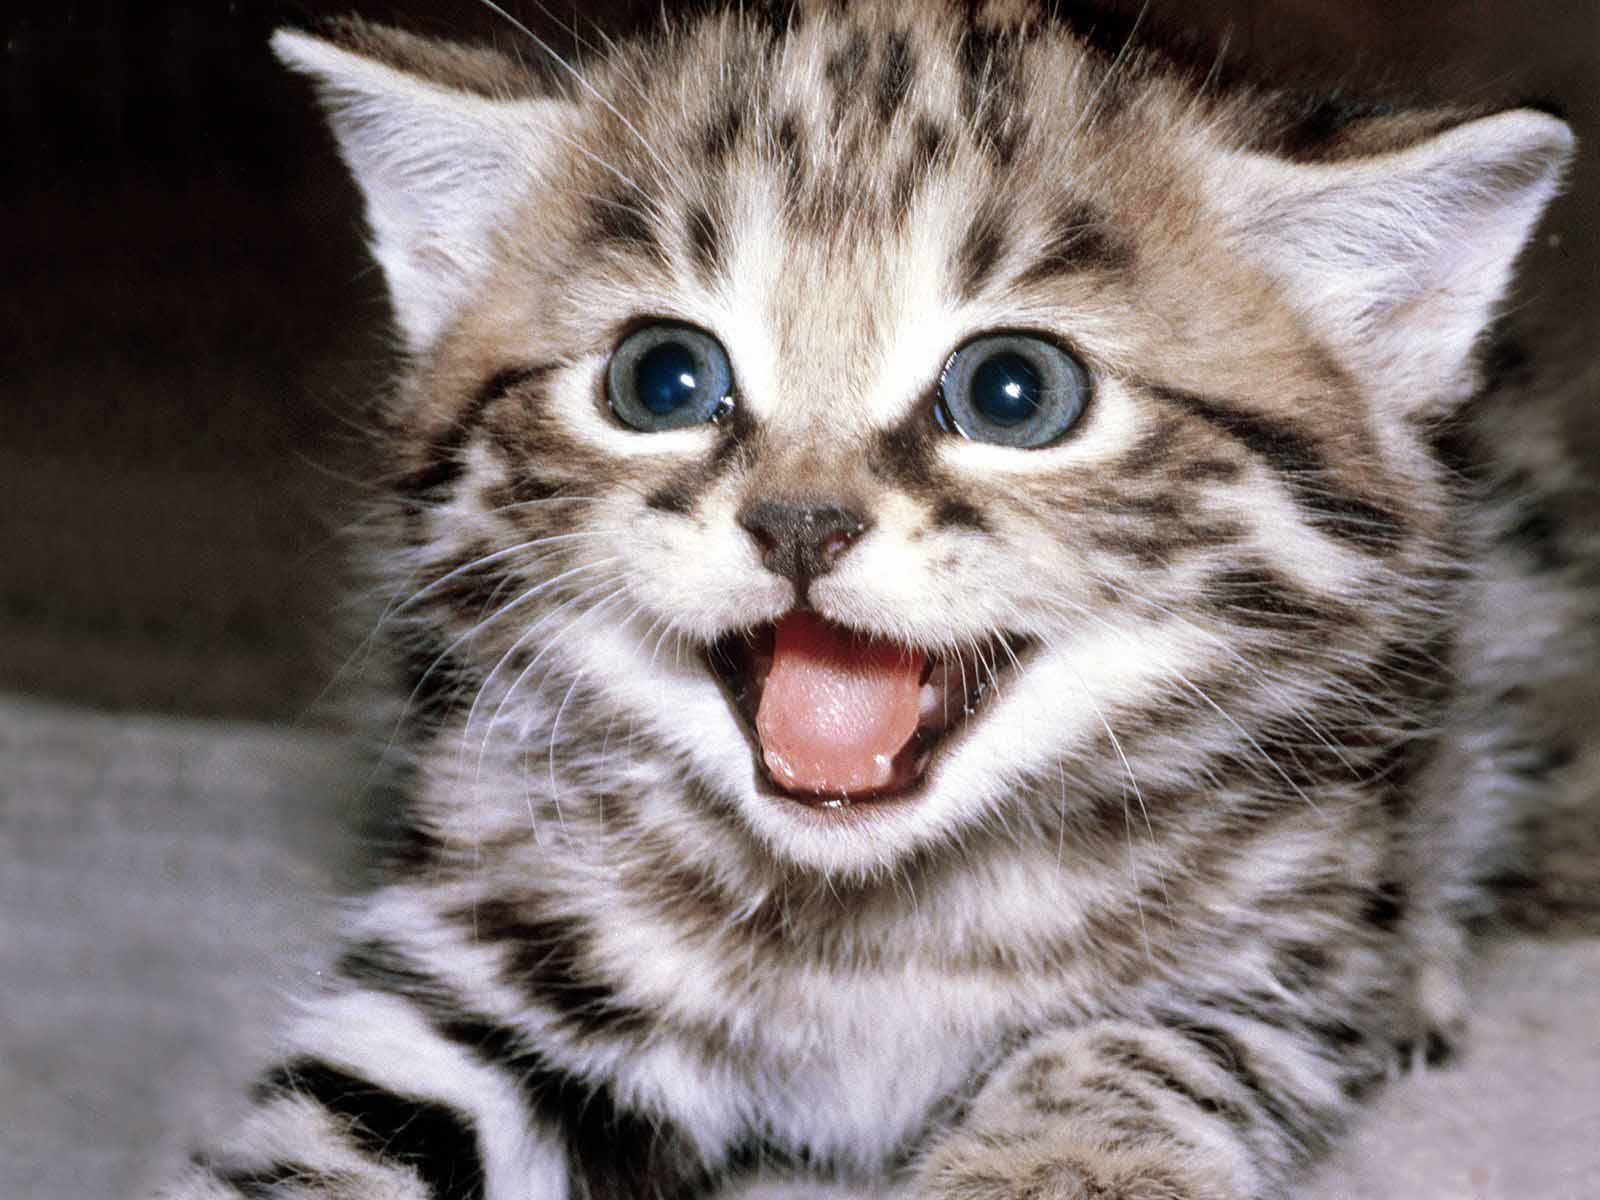 Unduh 68+  Gambar Animasi Kucing Lucu Dan Imut Lucu